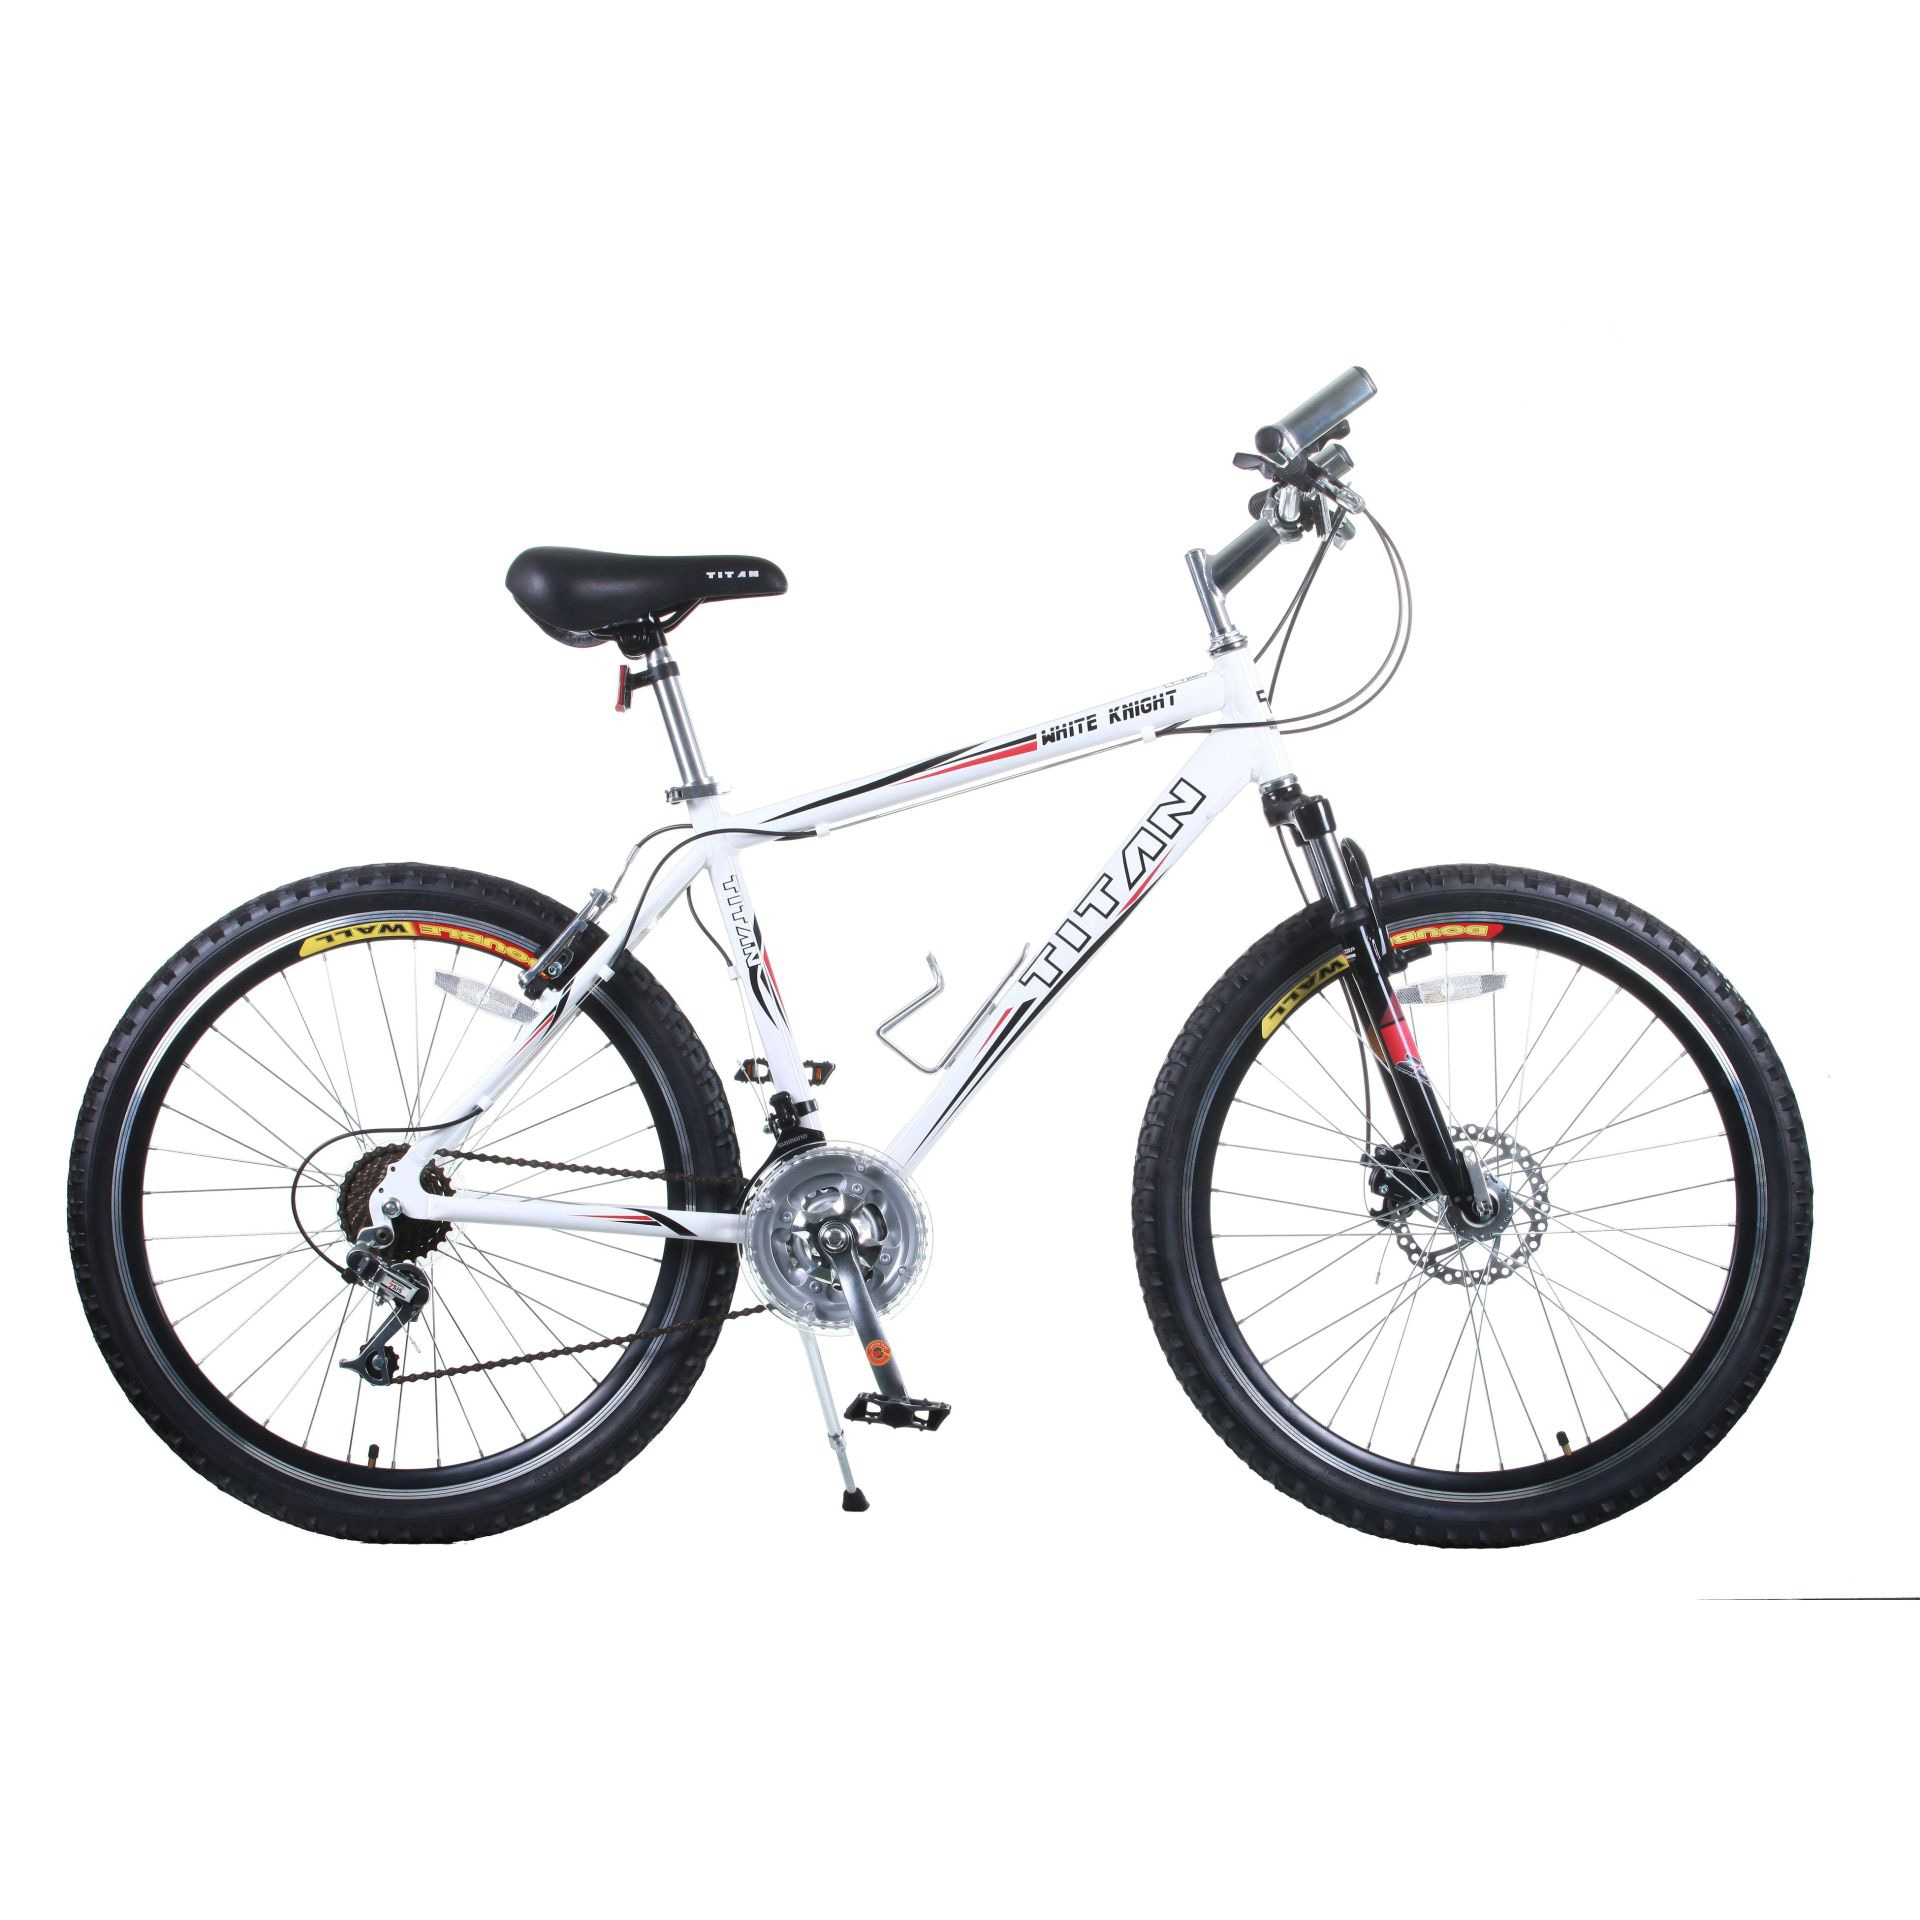 BLOCKS 2PCS BLACK BICYCLE MOUNTAIN BIKE ALL WEATHER MTB ATB PADS